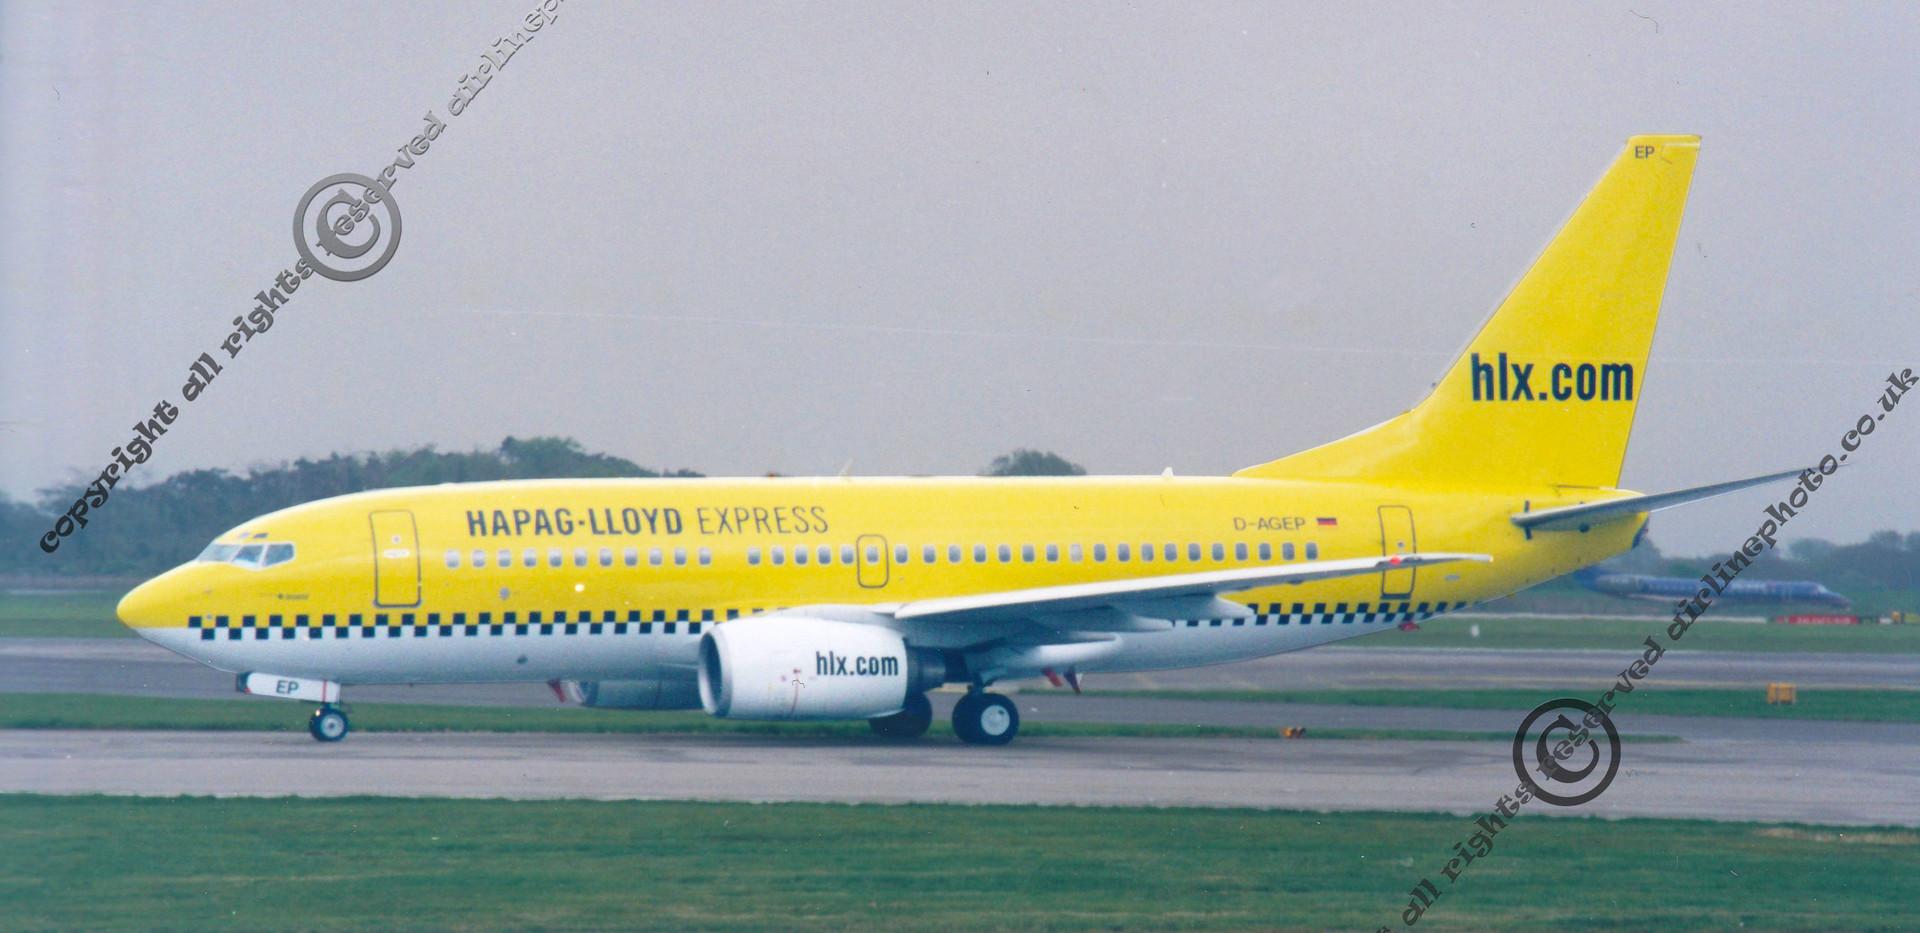 D-AGEP-Hapag-Lloyd-Express-737.jpg